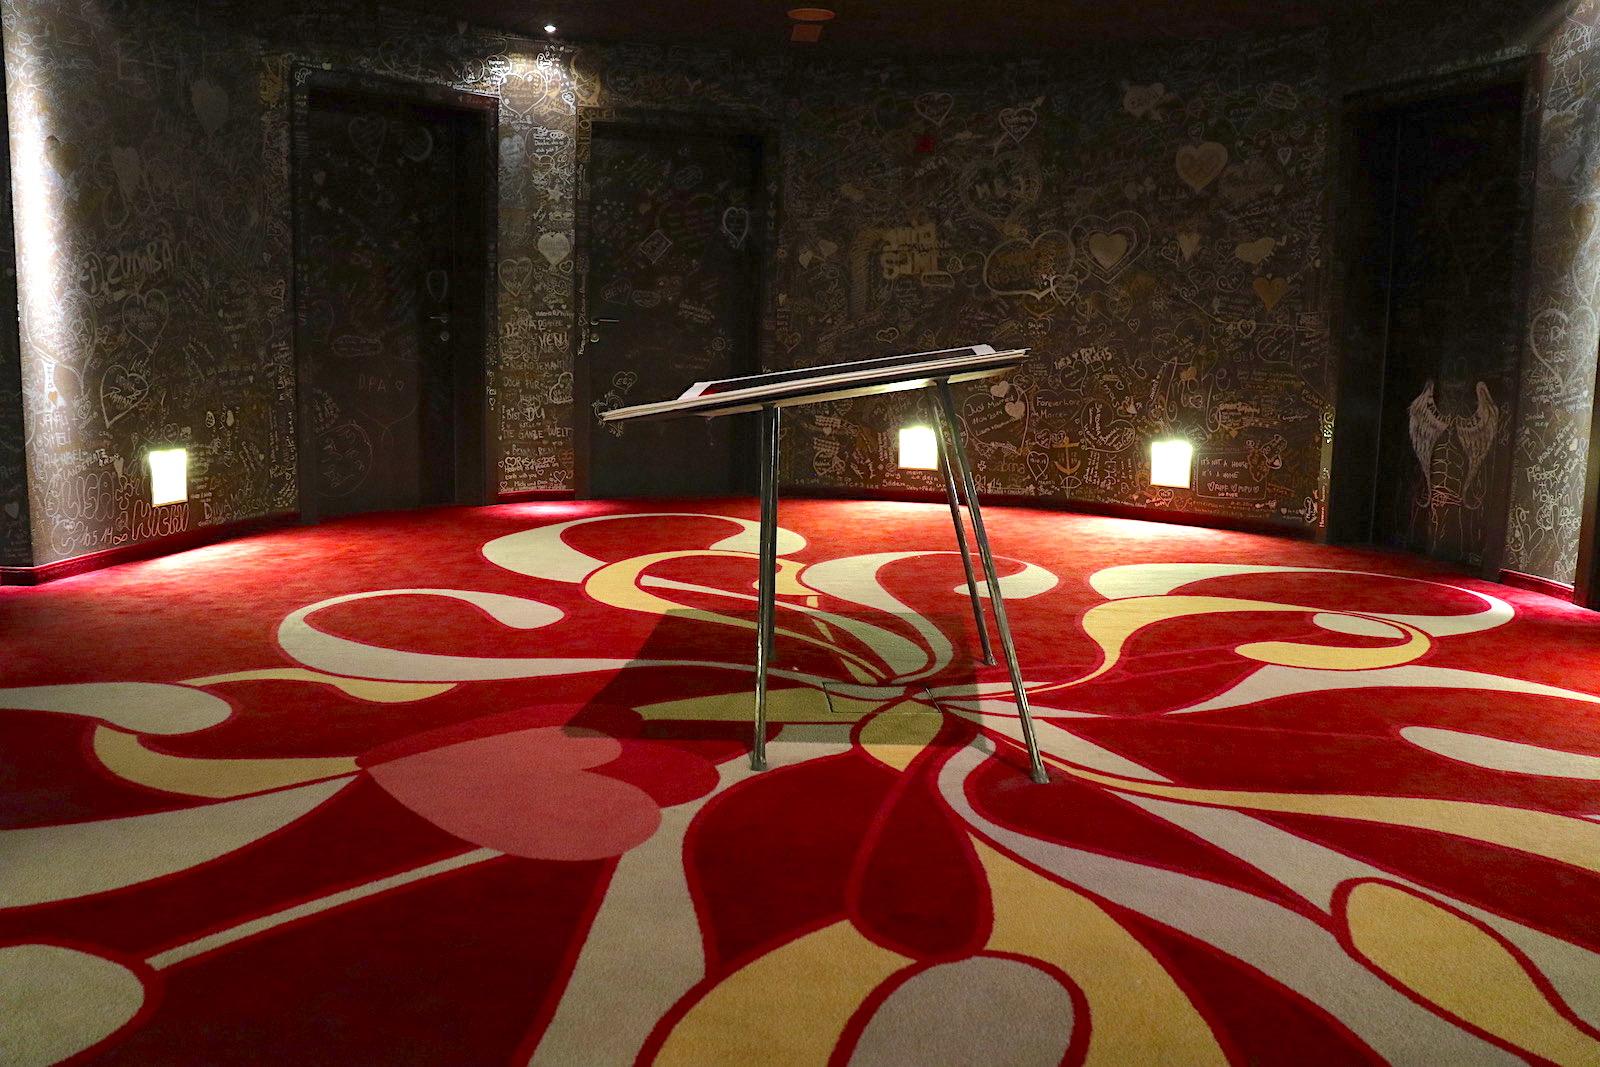 Hotel Gams. Wir bitten um eure Widmung: Liebesgrüße der Gäste an den Wänden des Rundbaus.